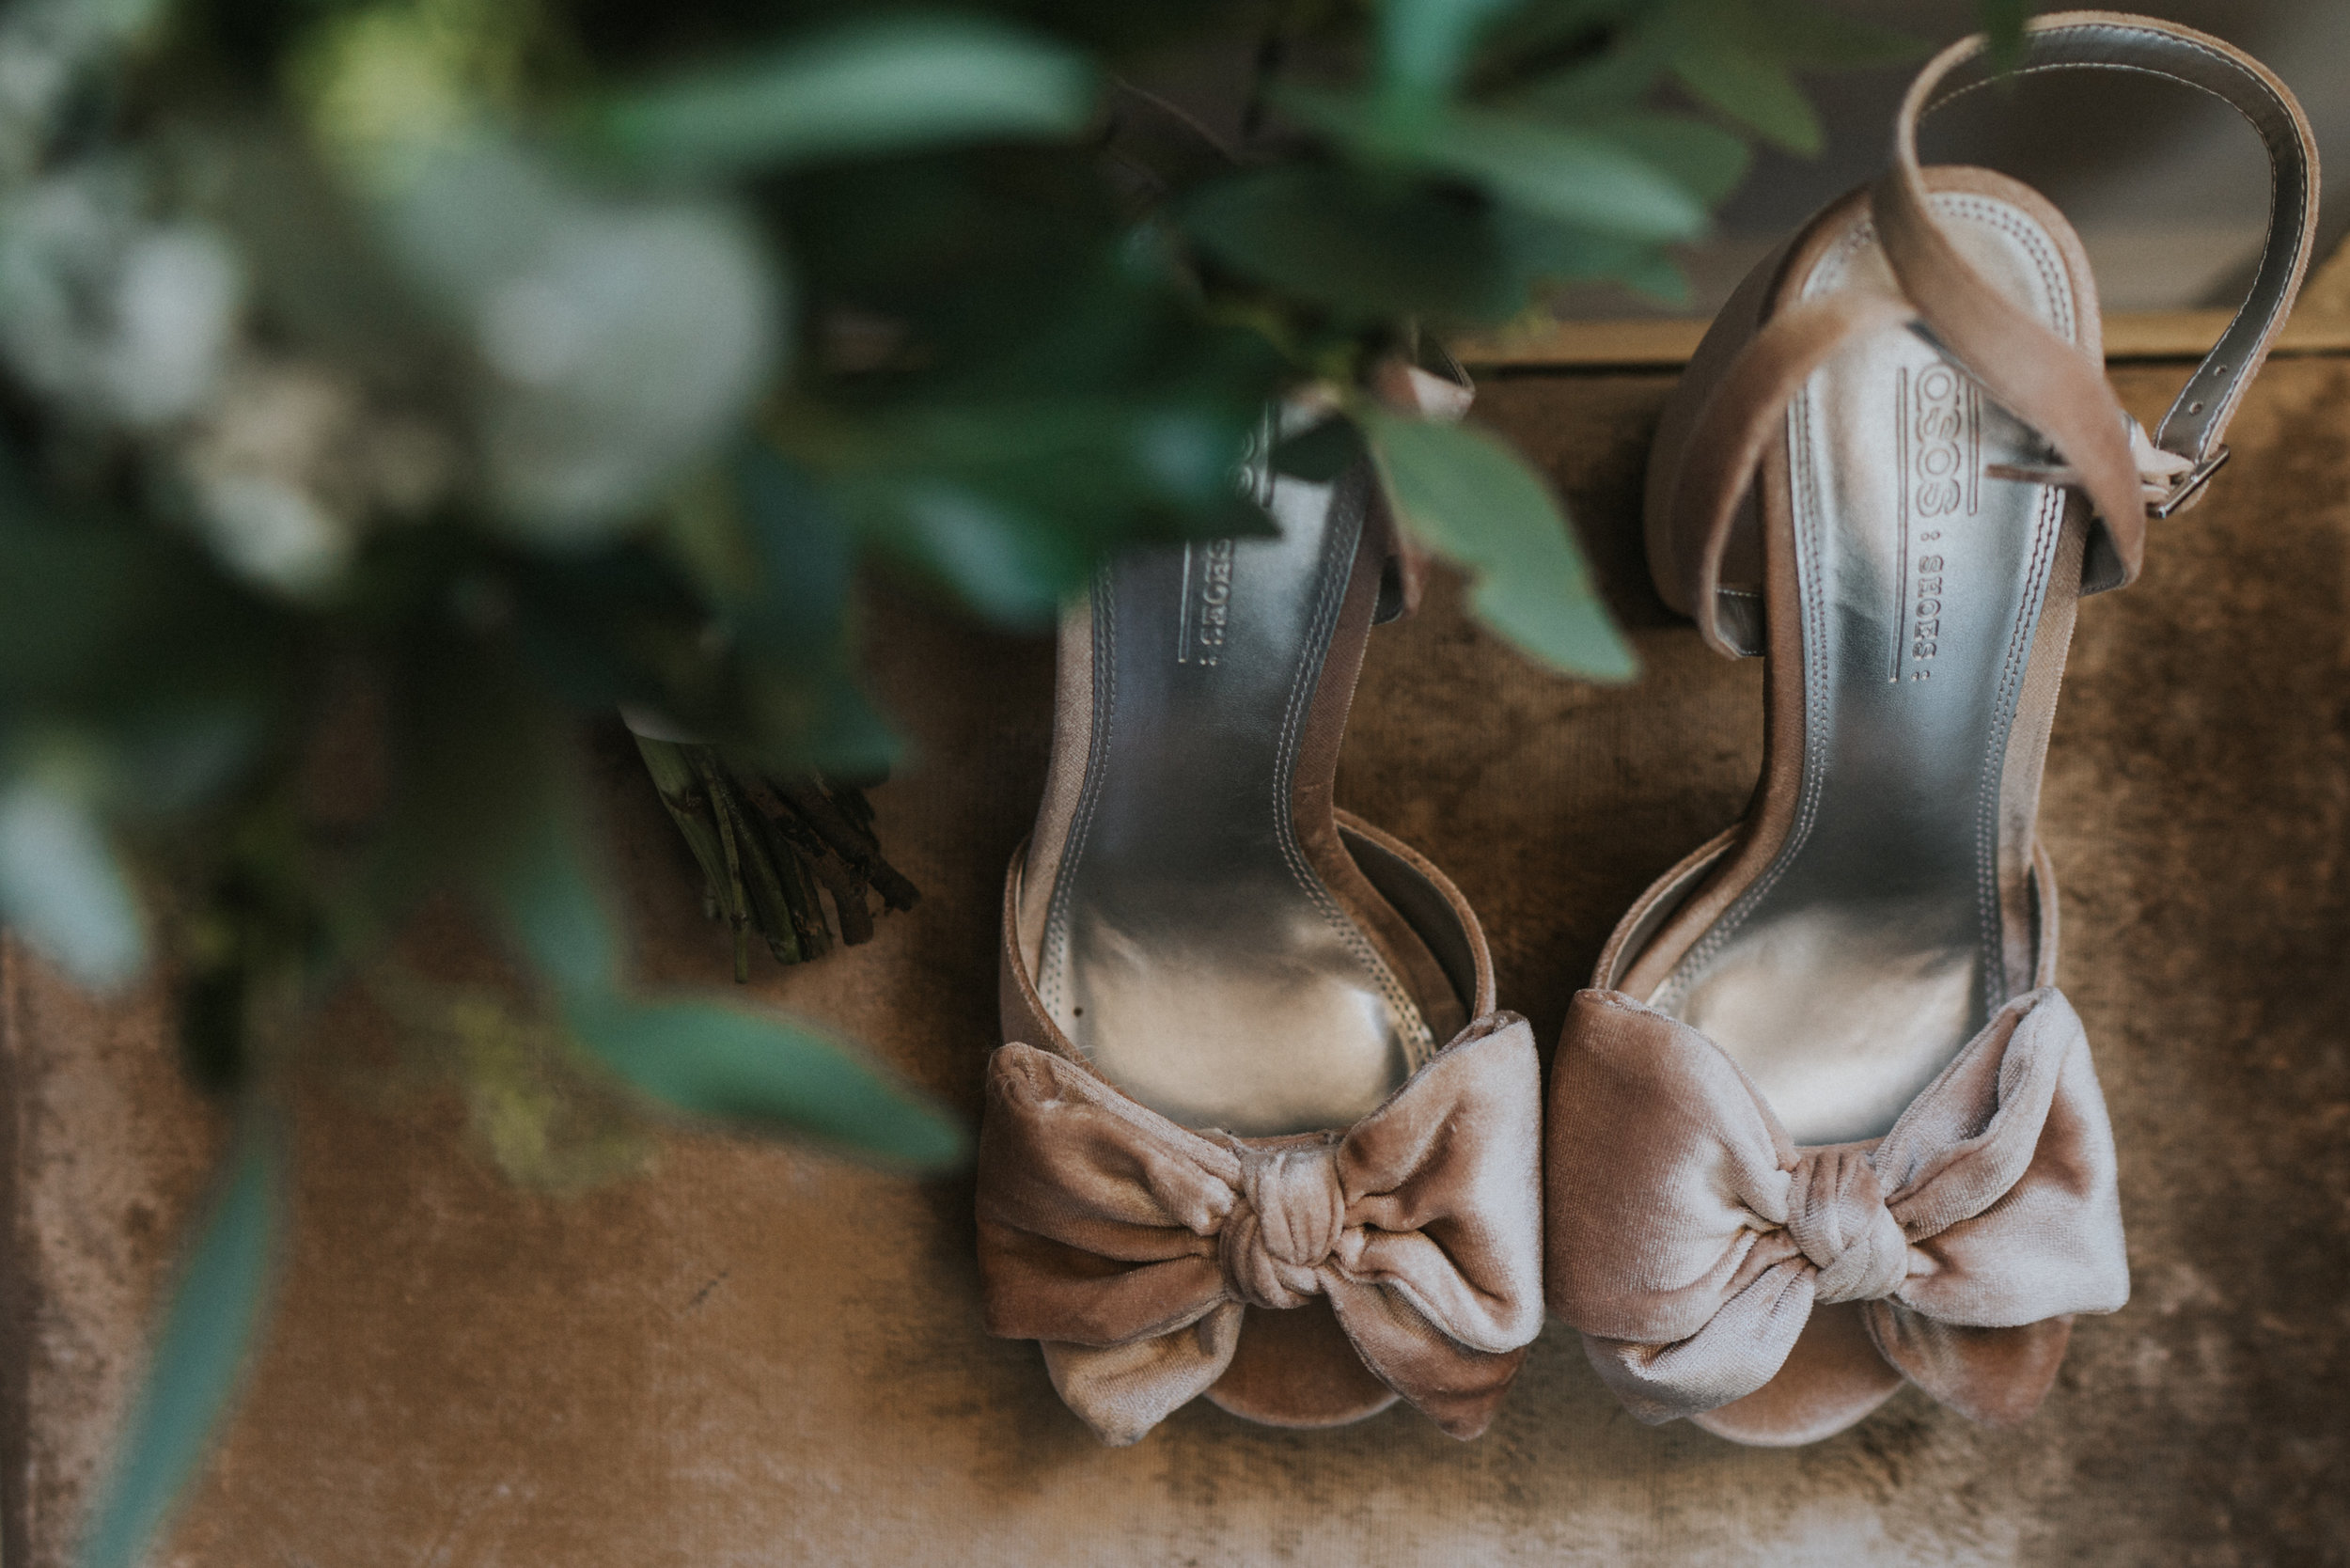 Sophie-Christian-Prested-Hall-Grace-Elizabeth-Previews-Essex-Norfolk-Suffolk-Devon-Alternative-Wedding-Photographer (2 of 20).jpg